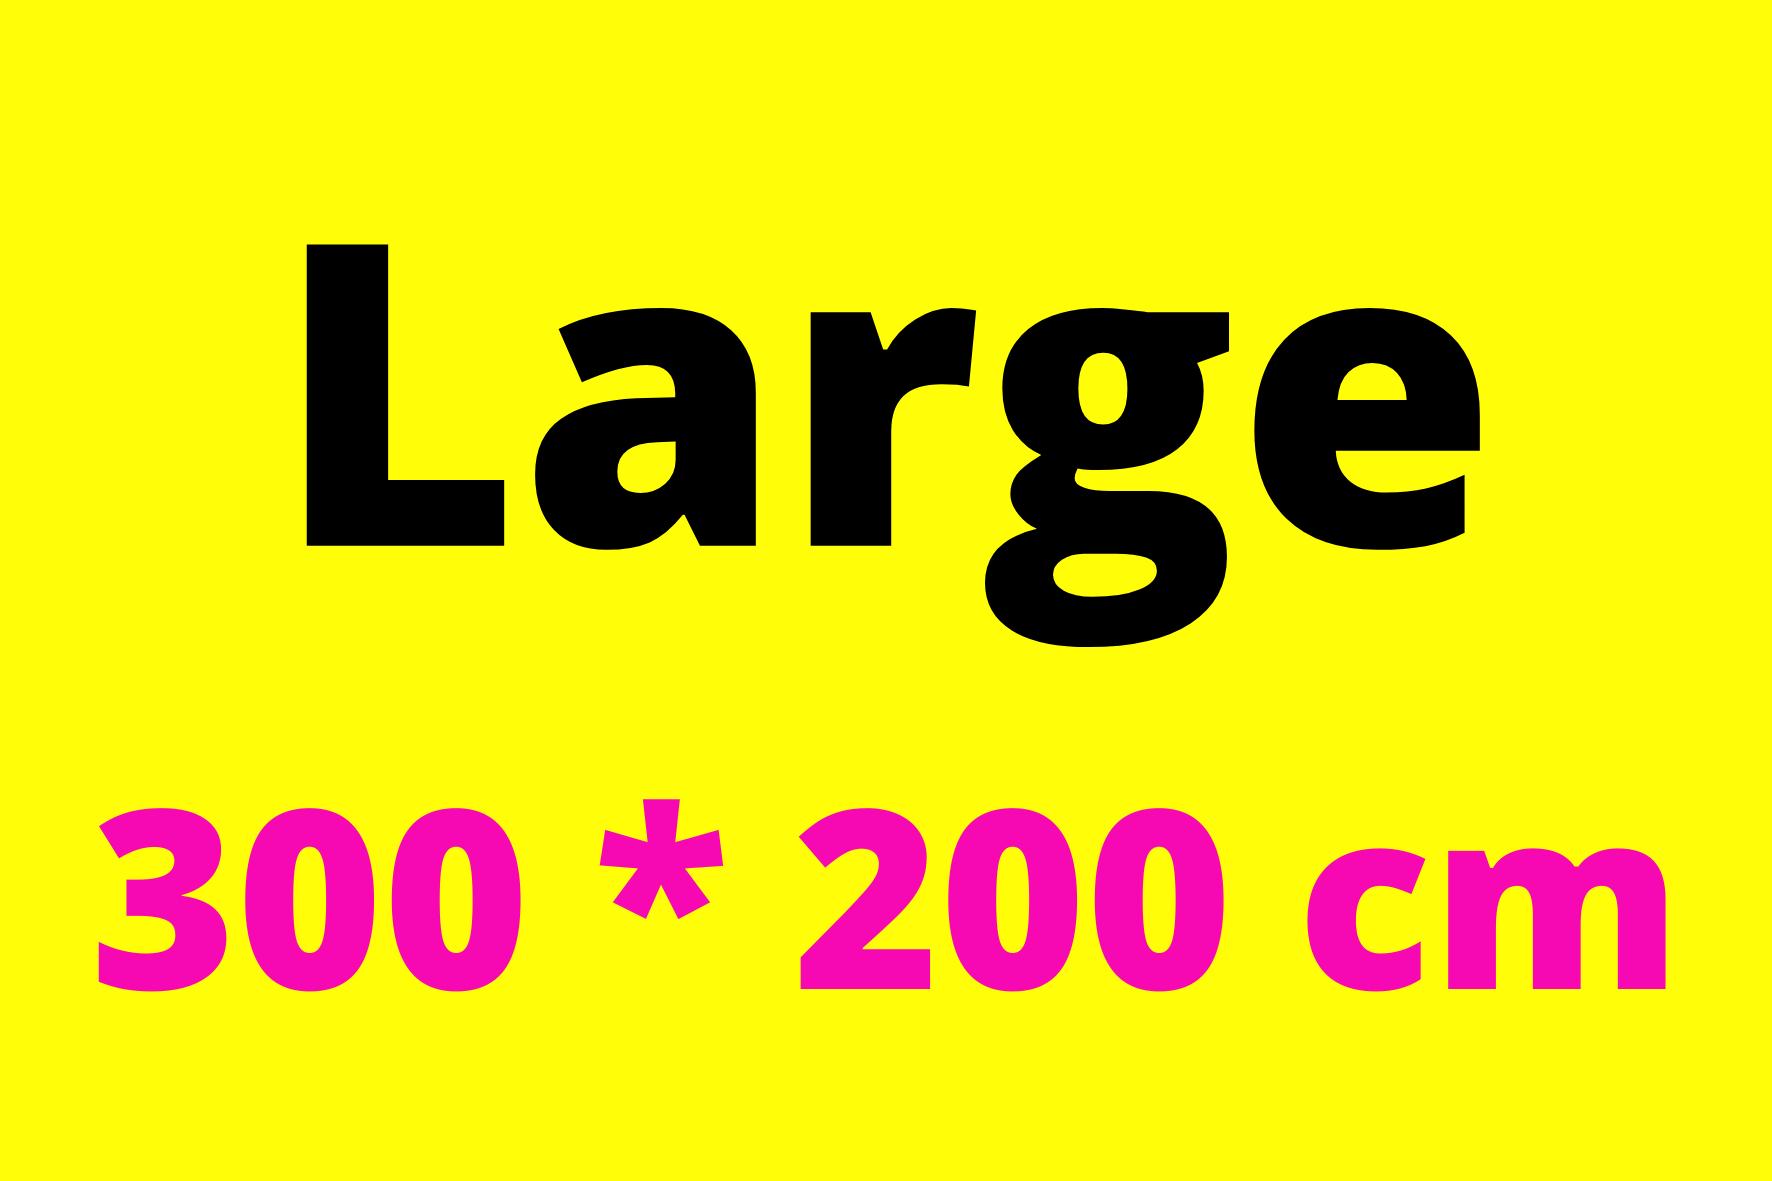 300*200 cm